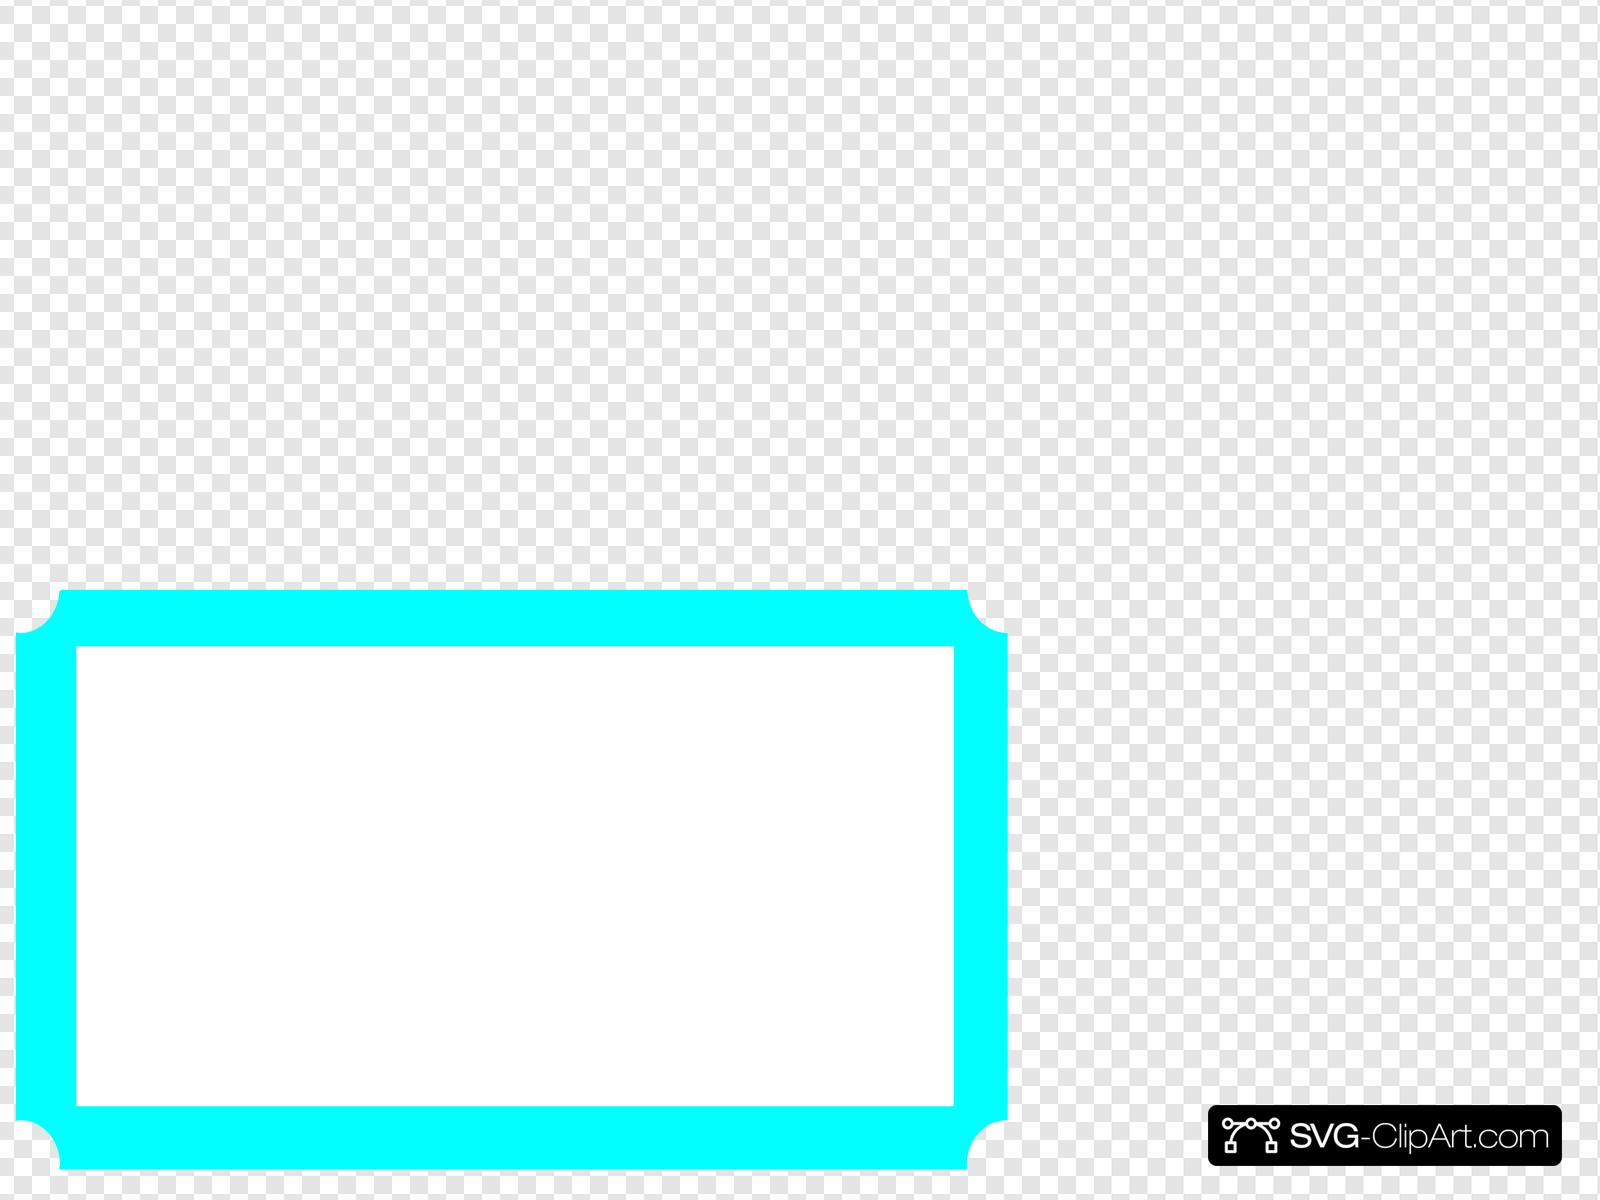 Ticket Border Clip art, Icon and SVG.